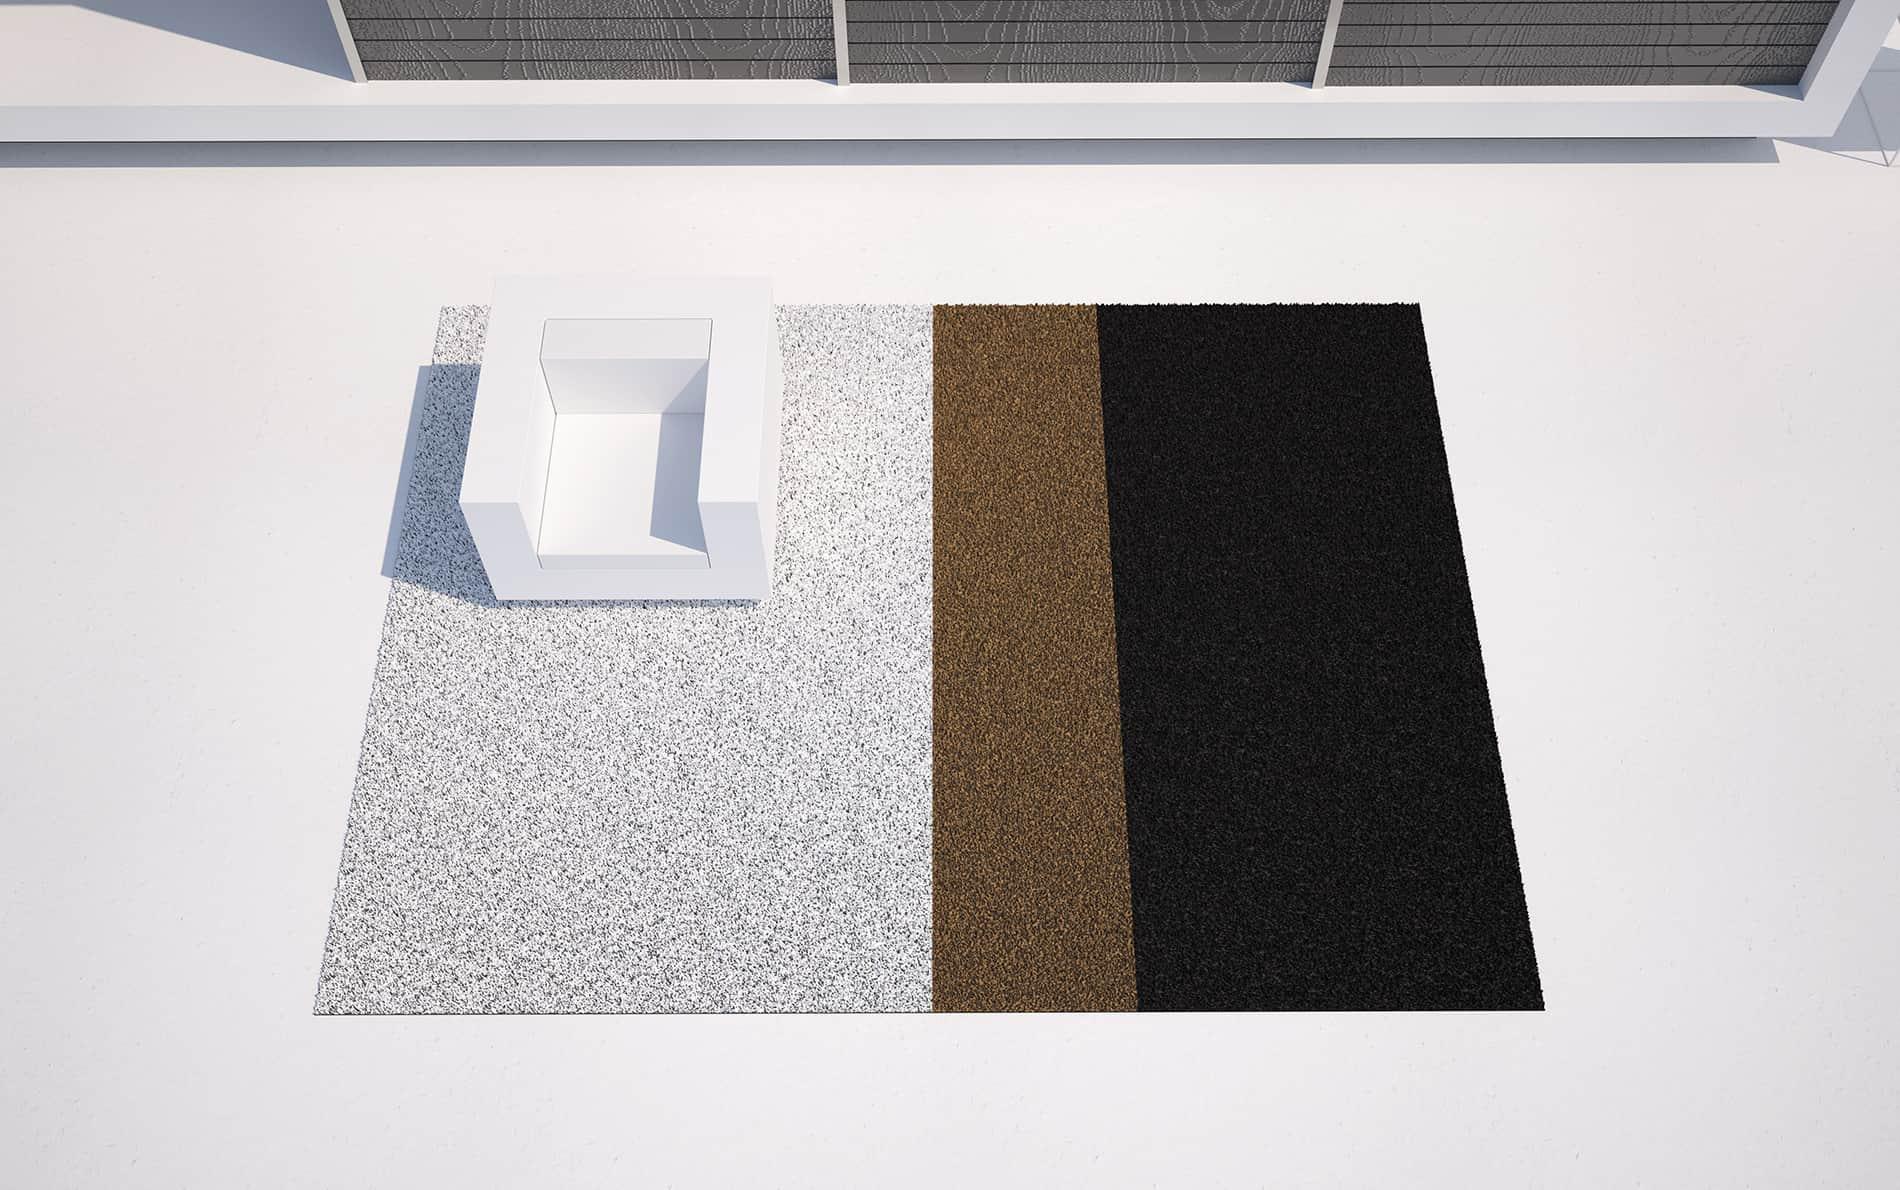 bett 2x2m g nstig kaufen. Black Bedroom Furniture Sets. Home Design Ideas